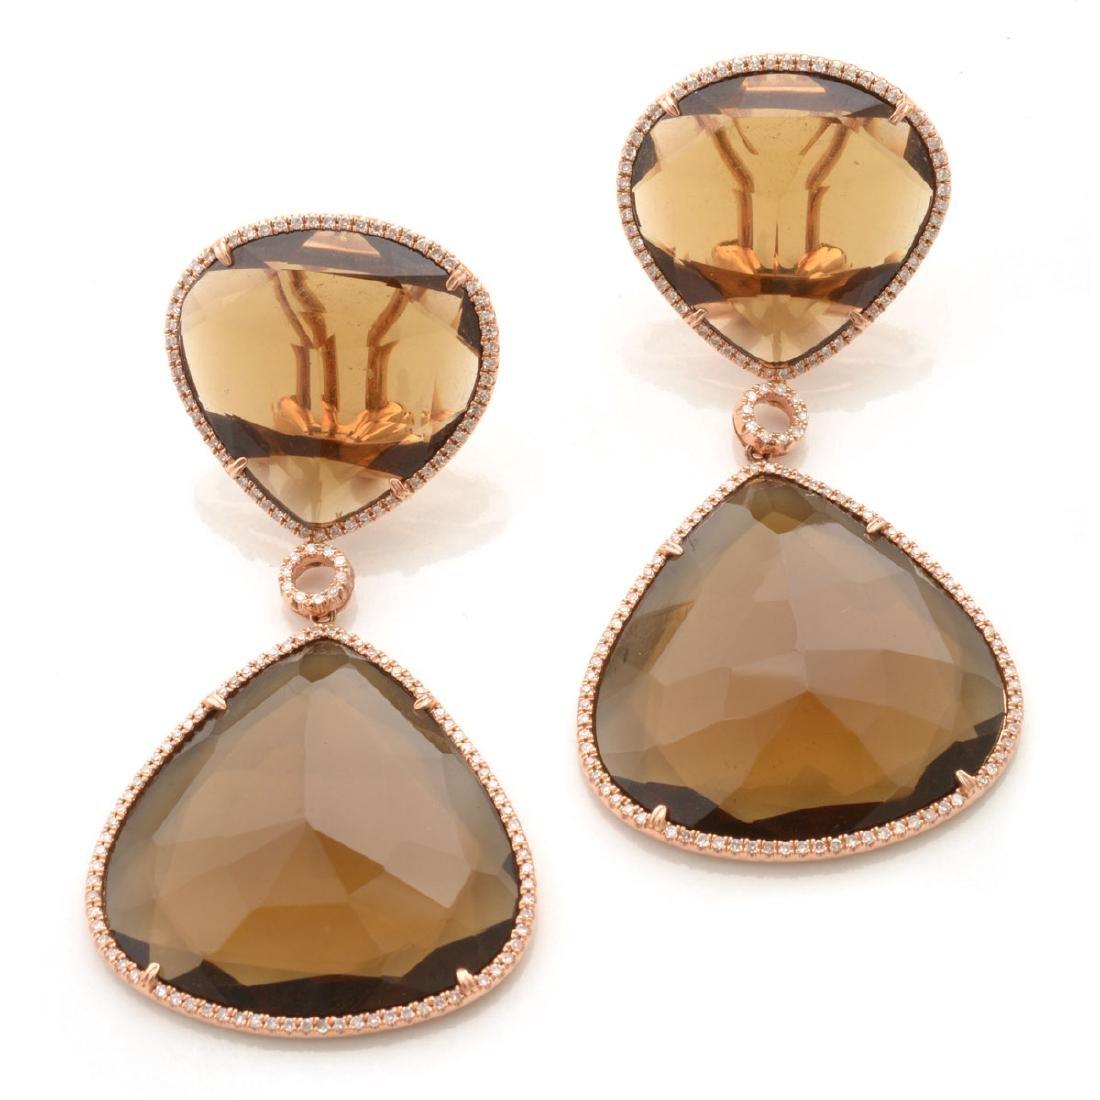 Pair of Smoky Quartz, Diamond, 14k Rose Gold Earrings.